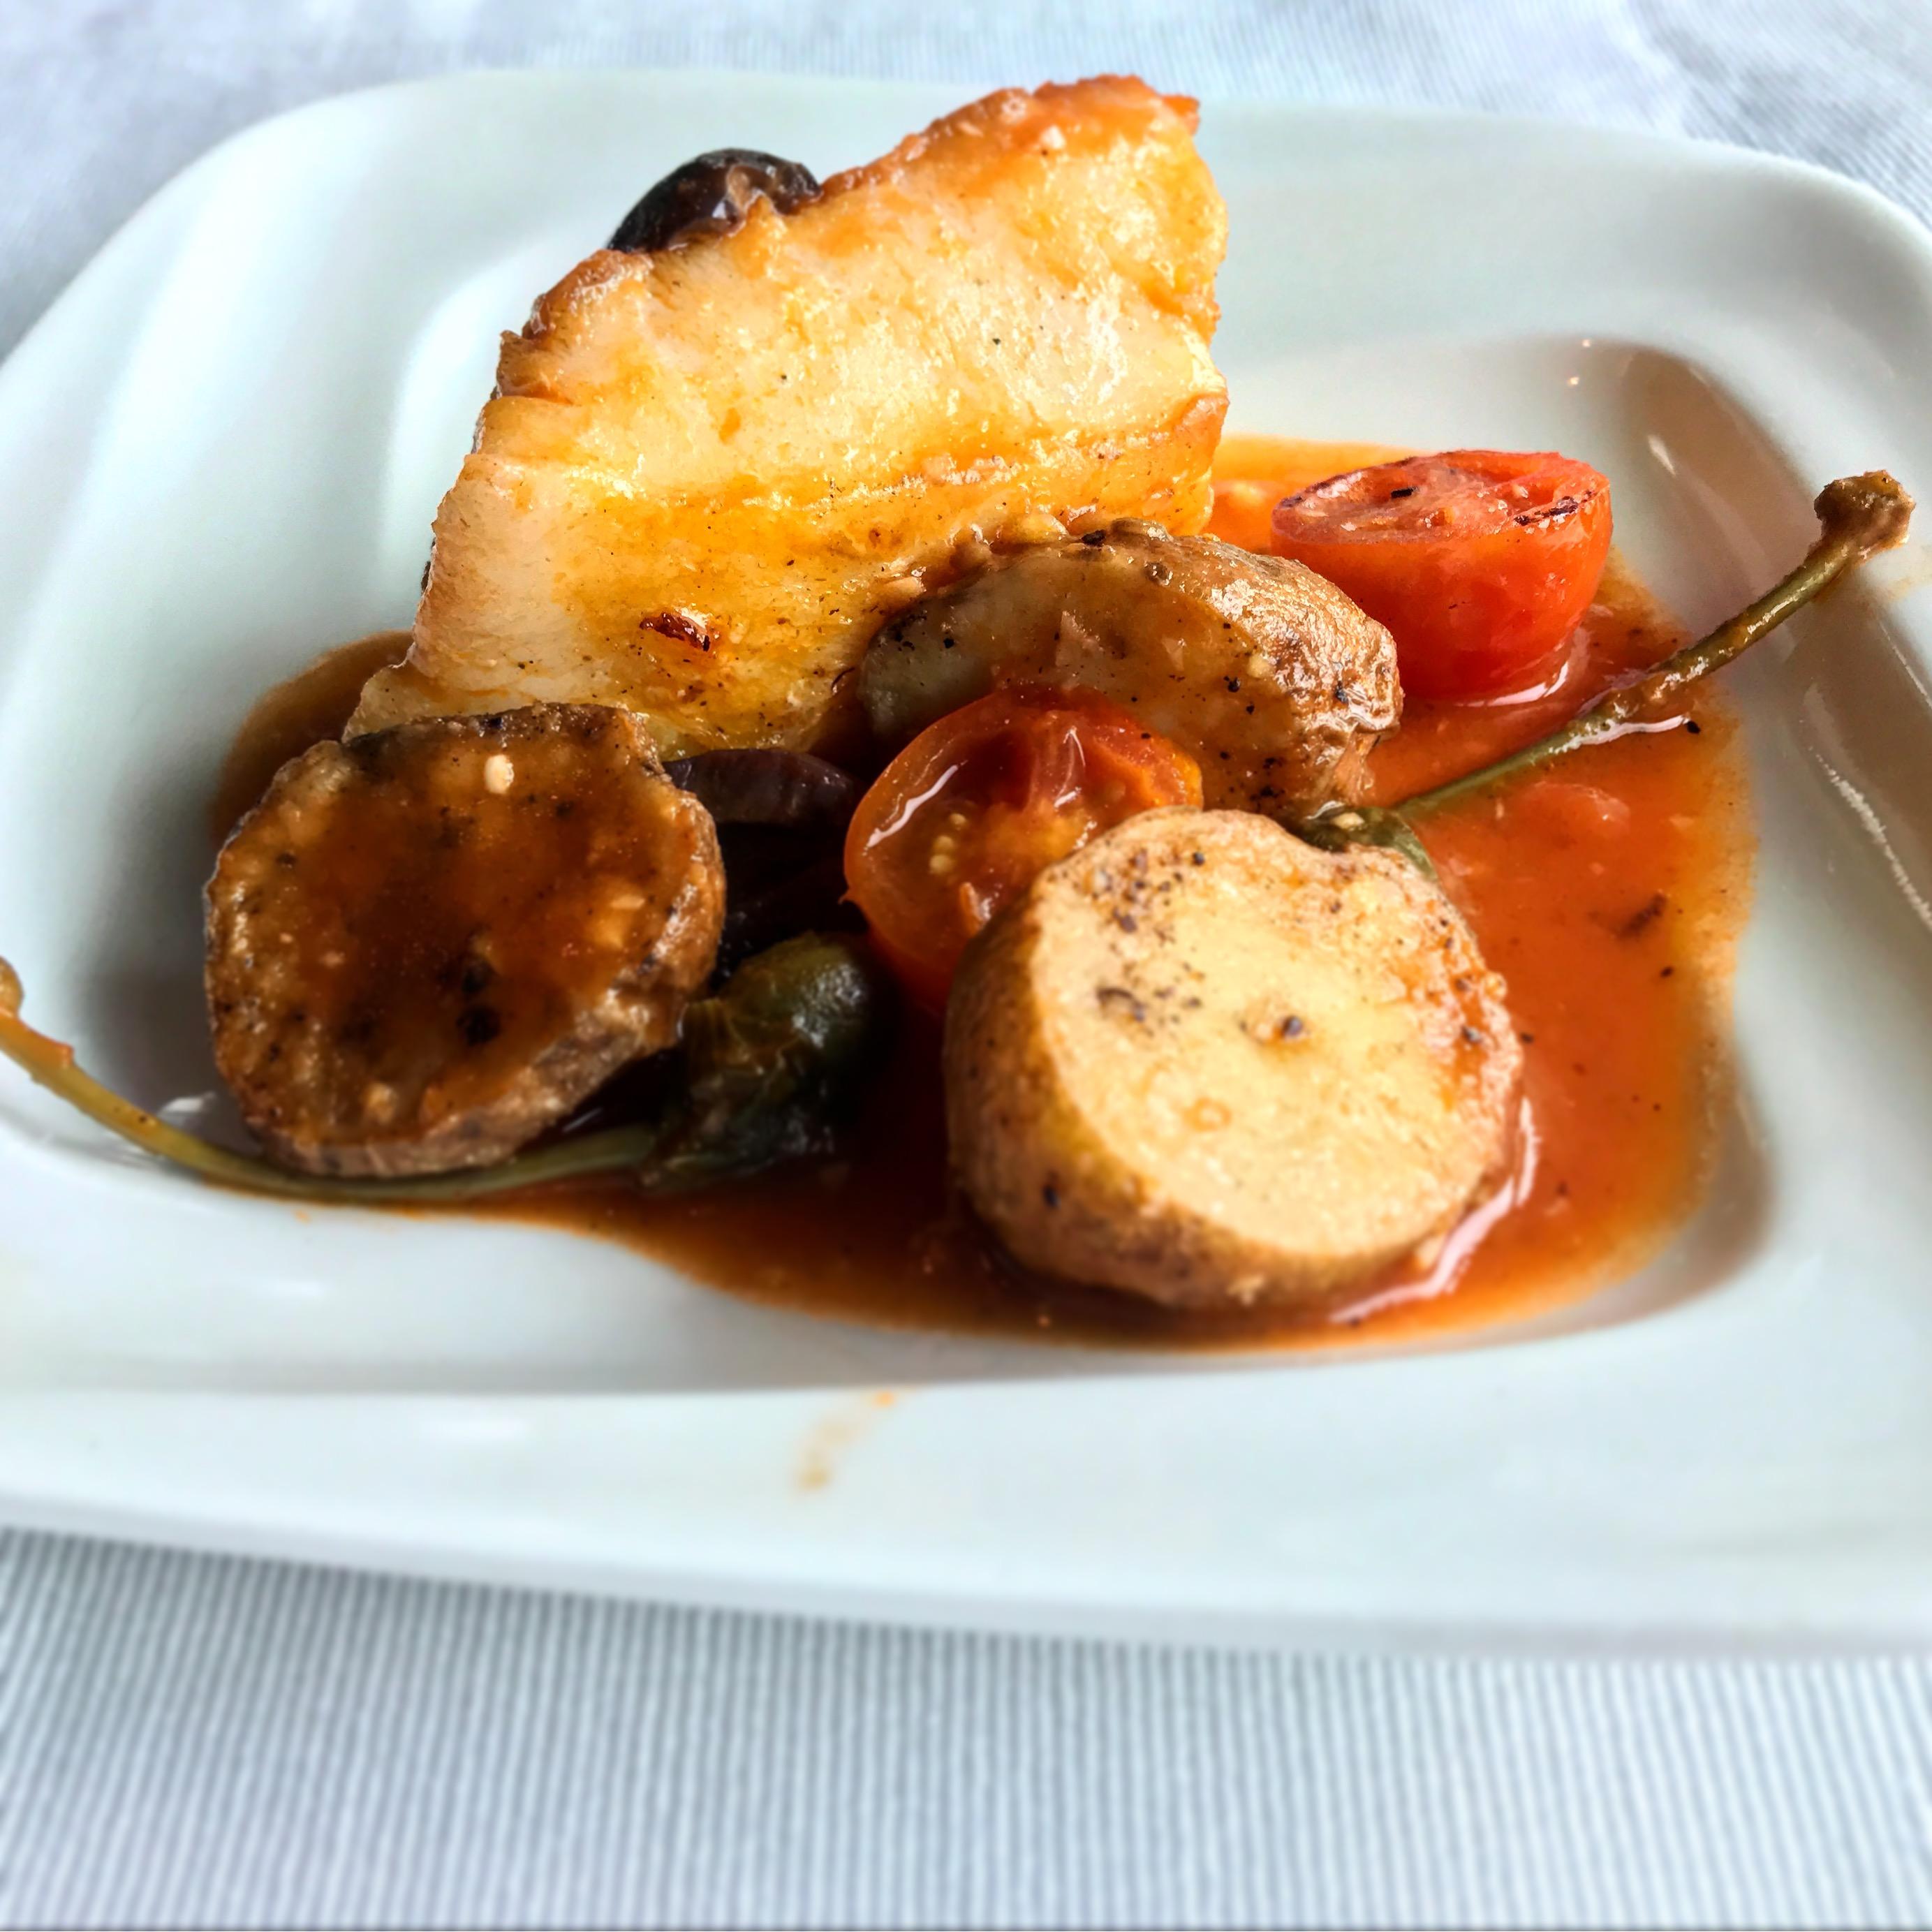 Zanotta - Pan Fried Seabass with Sweet Tomato sauce